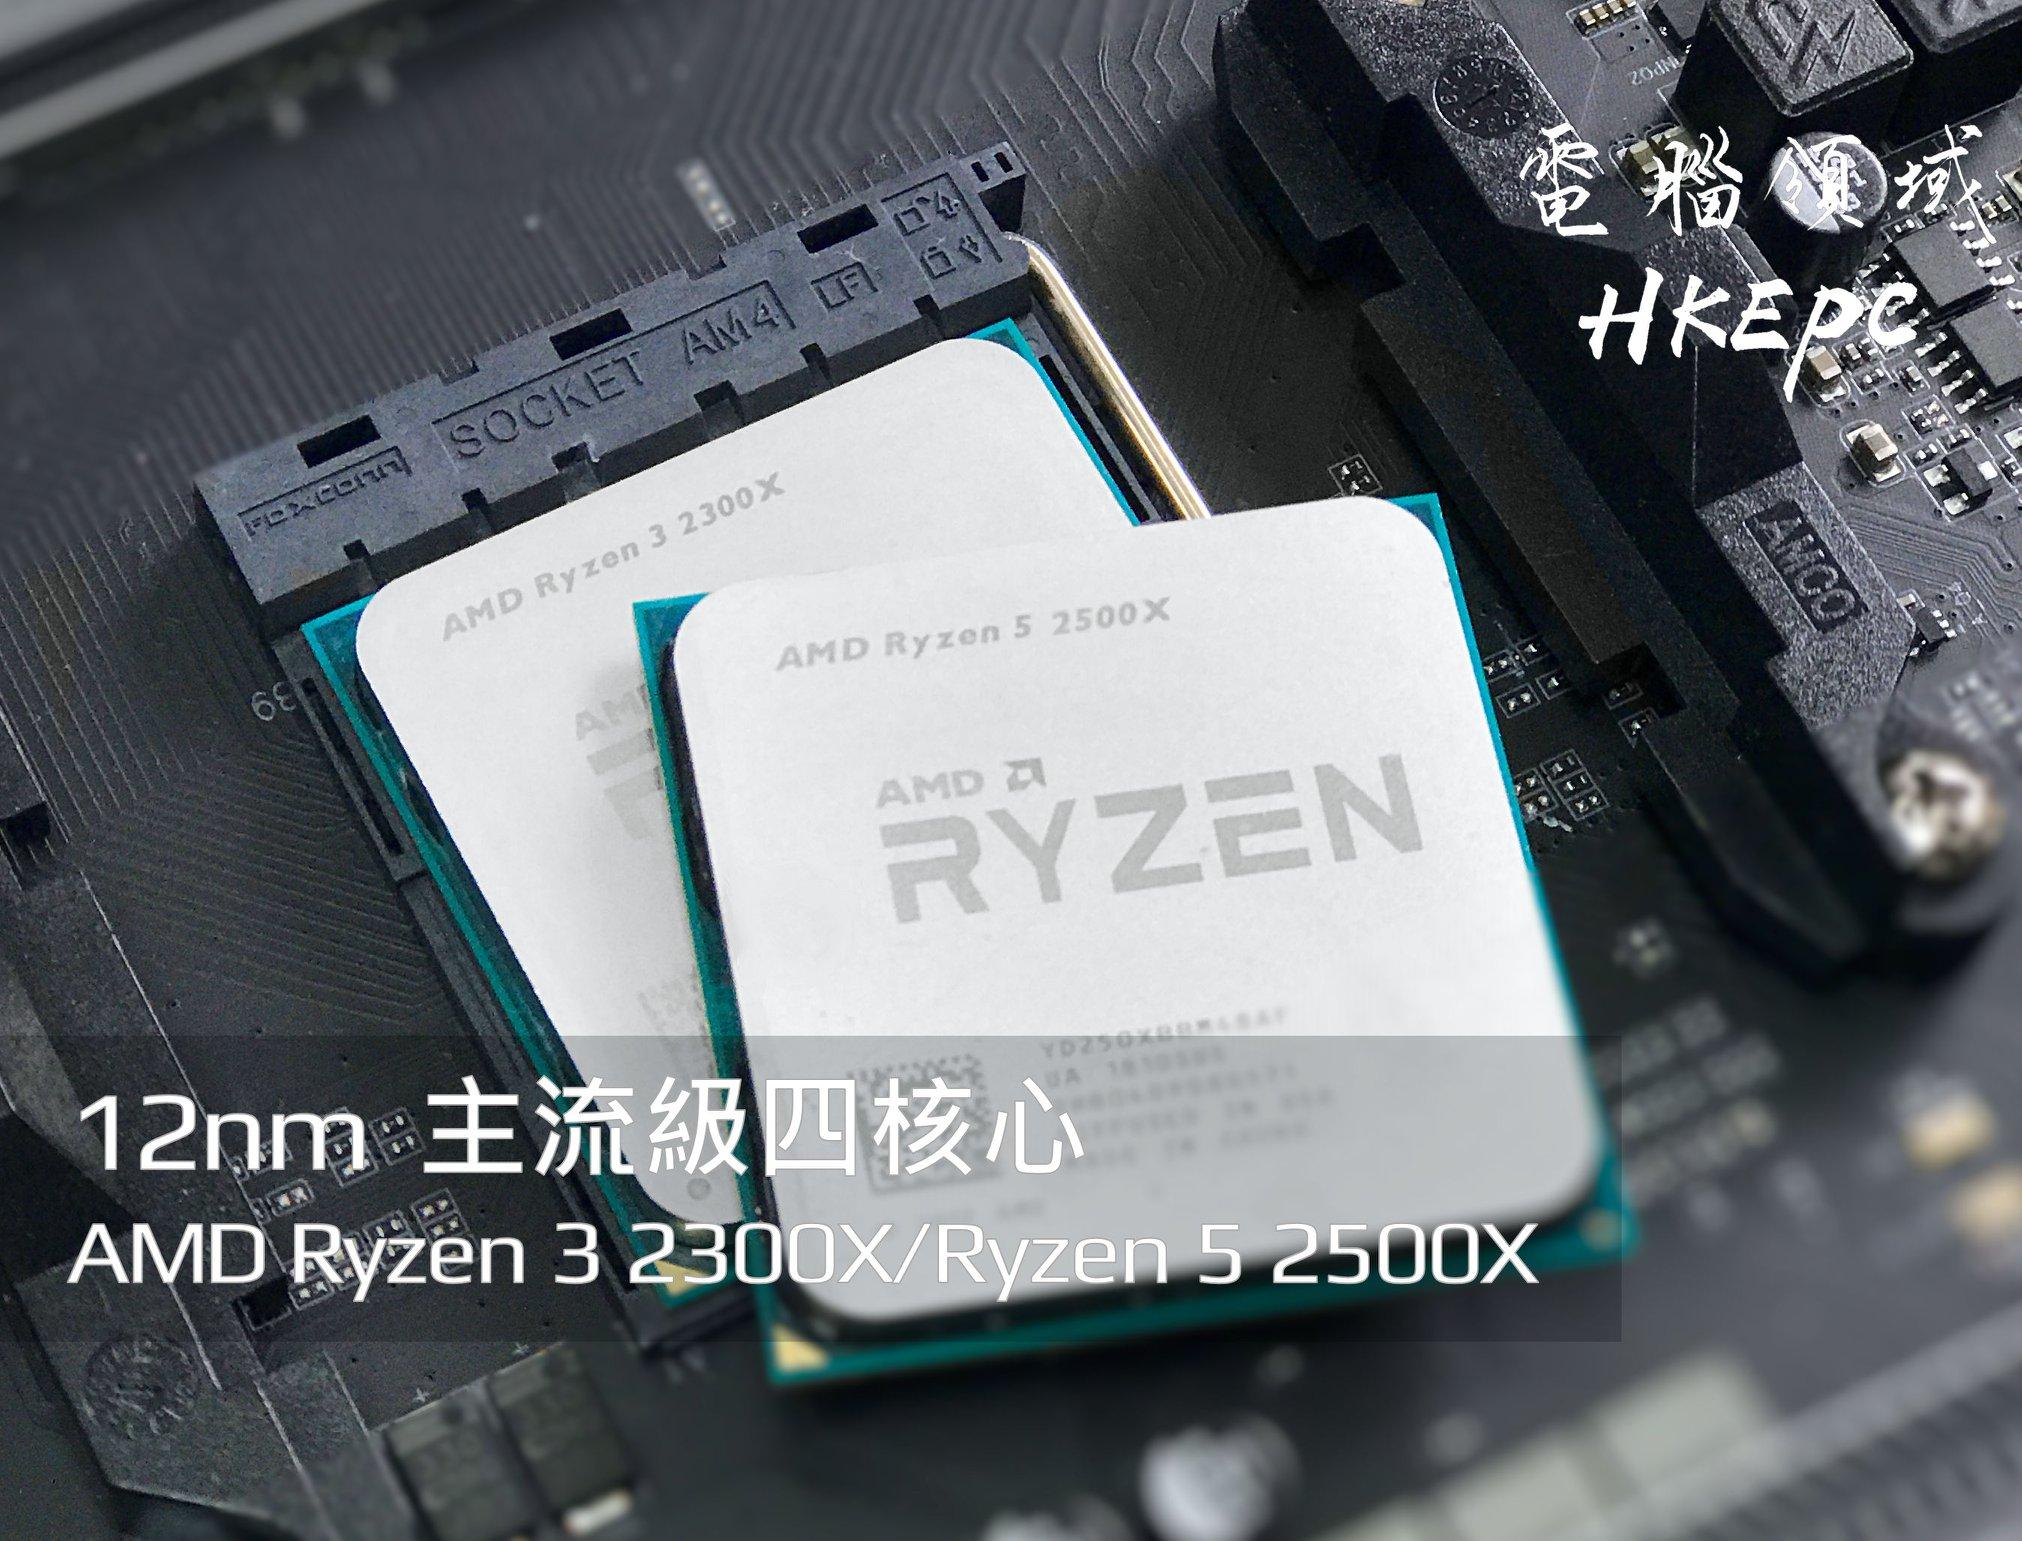 AMD Ryzen 2500X 2300X